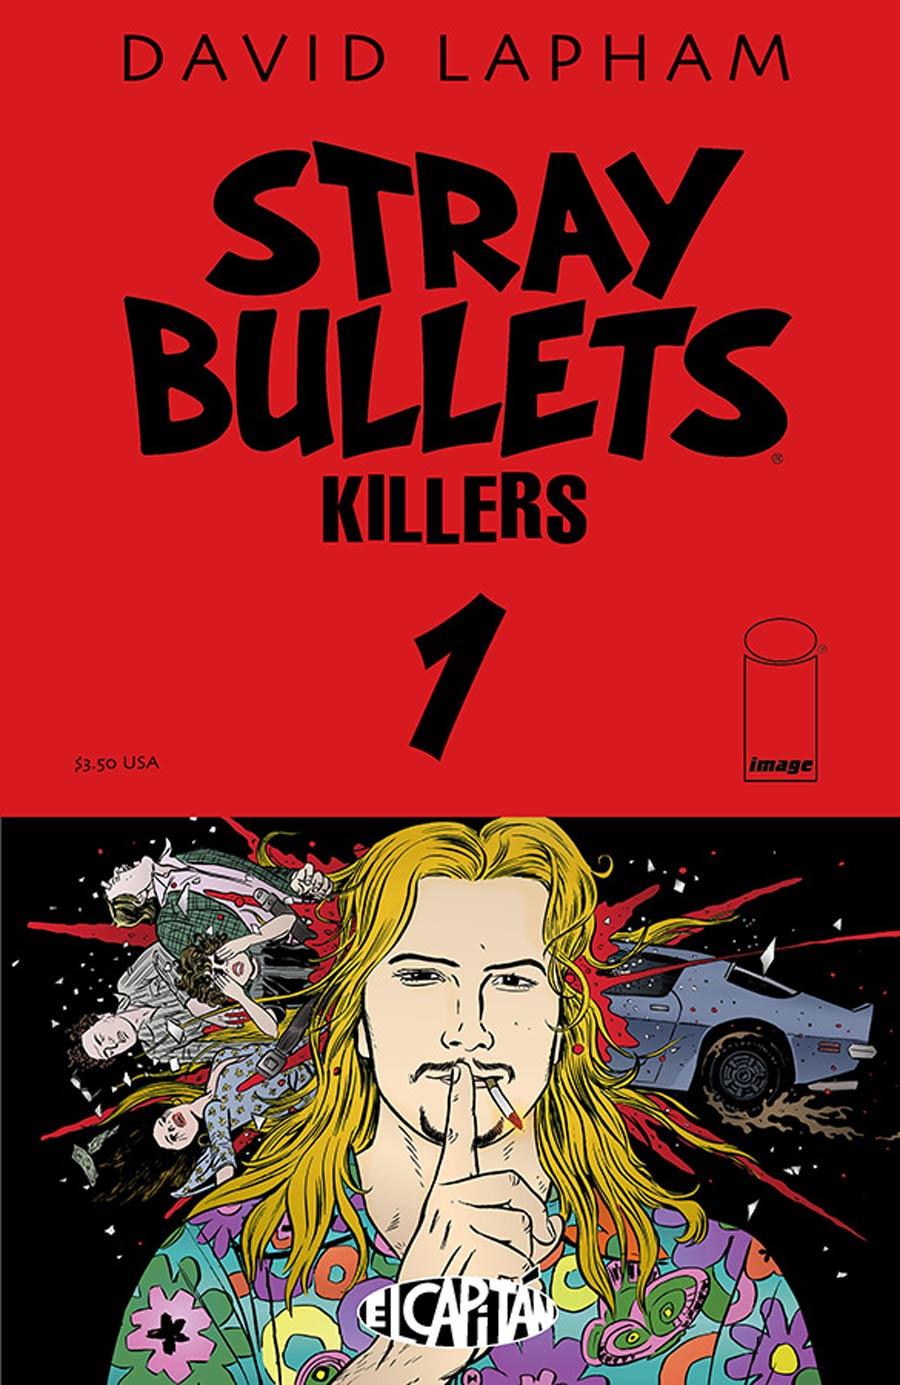 Stray Bullets Killers #1